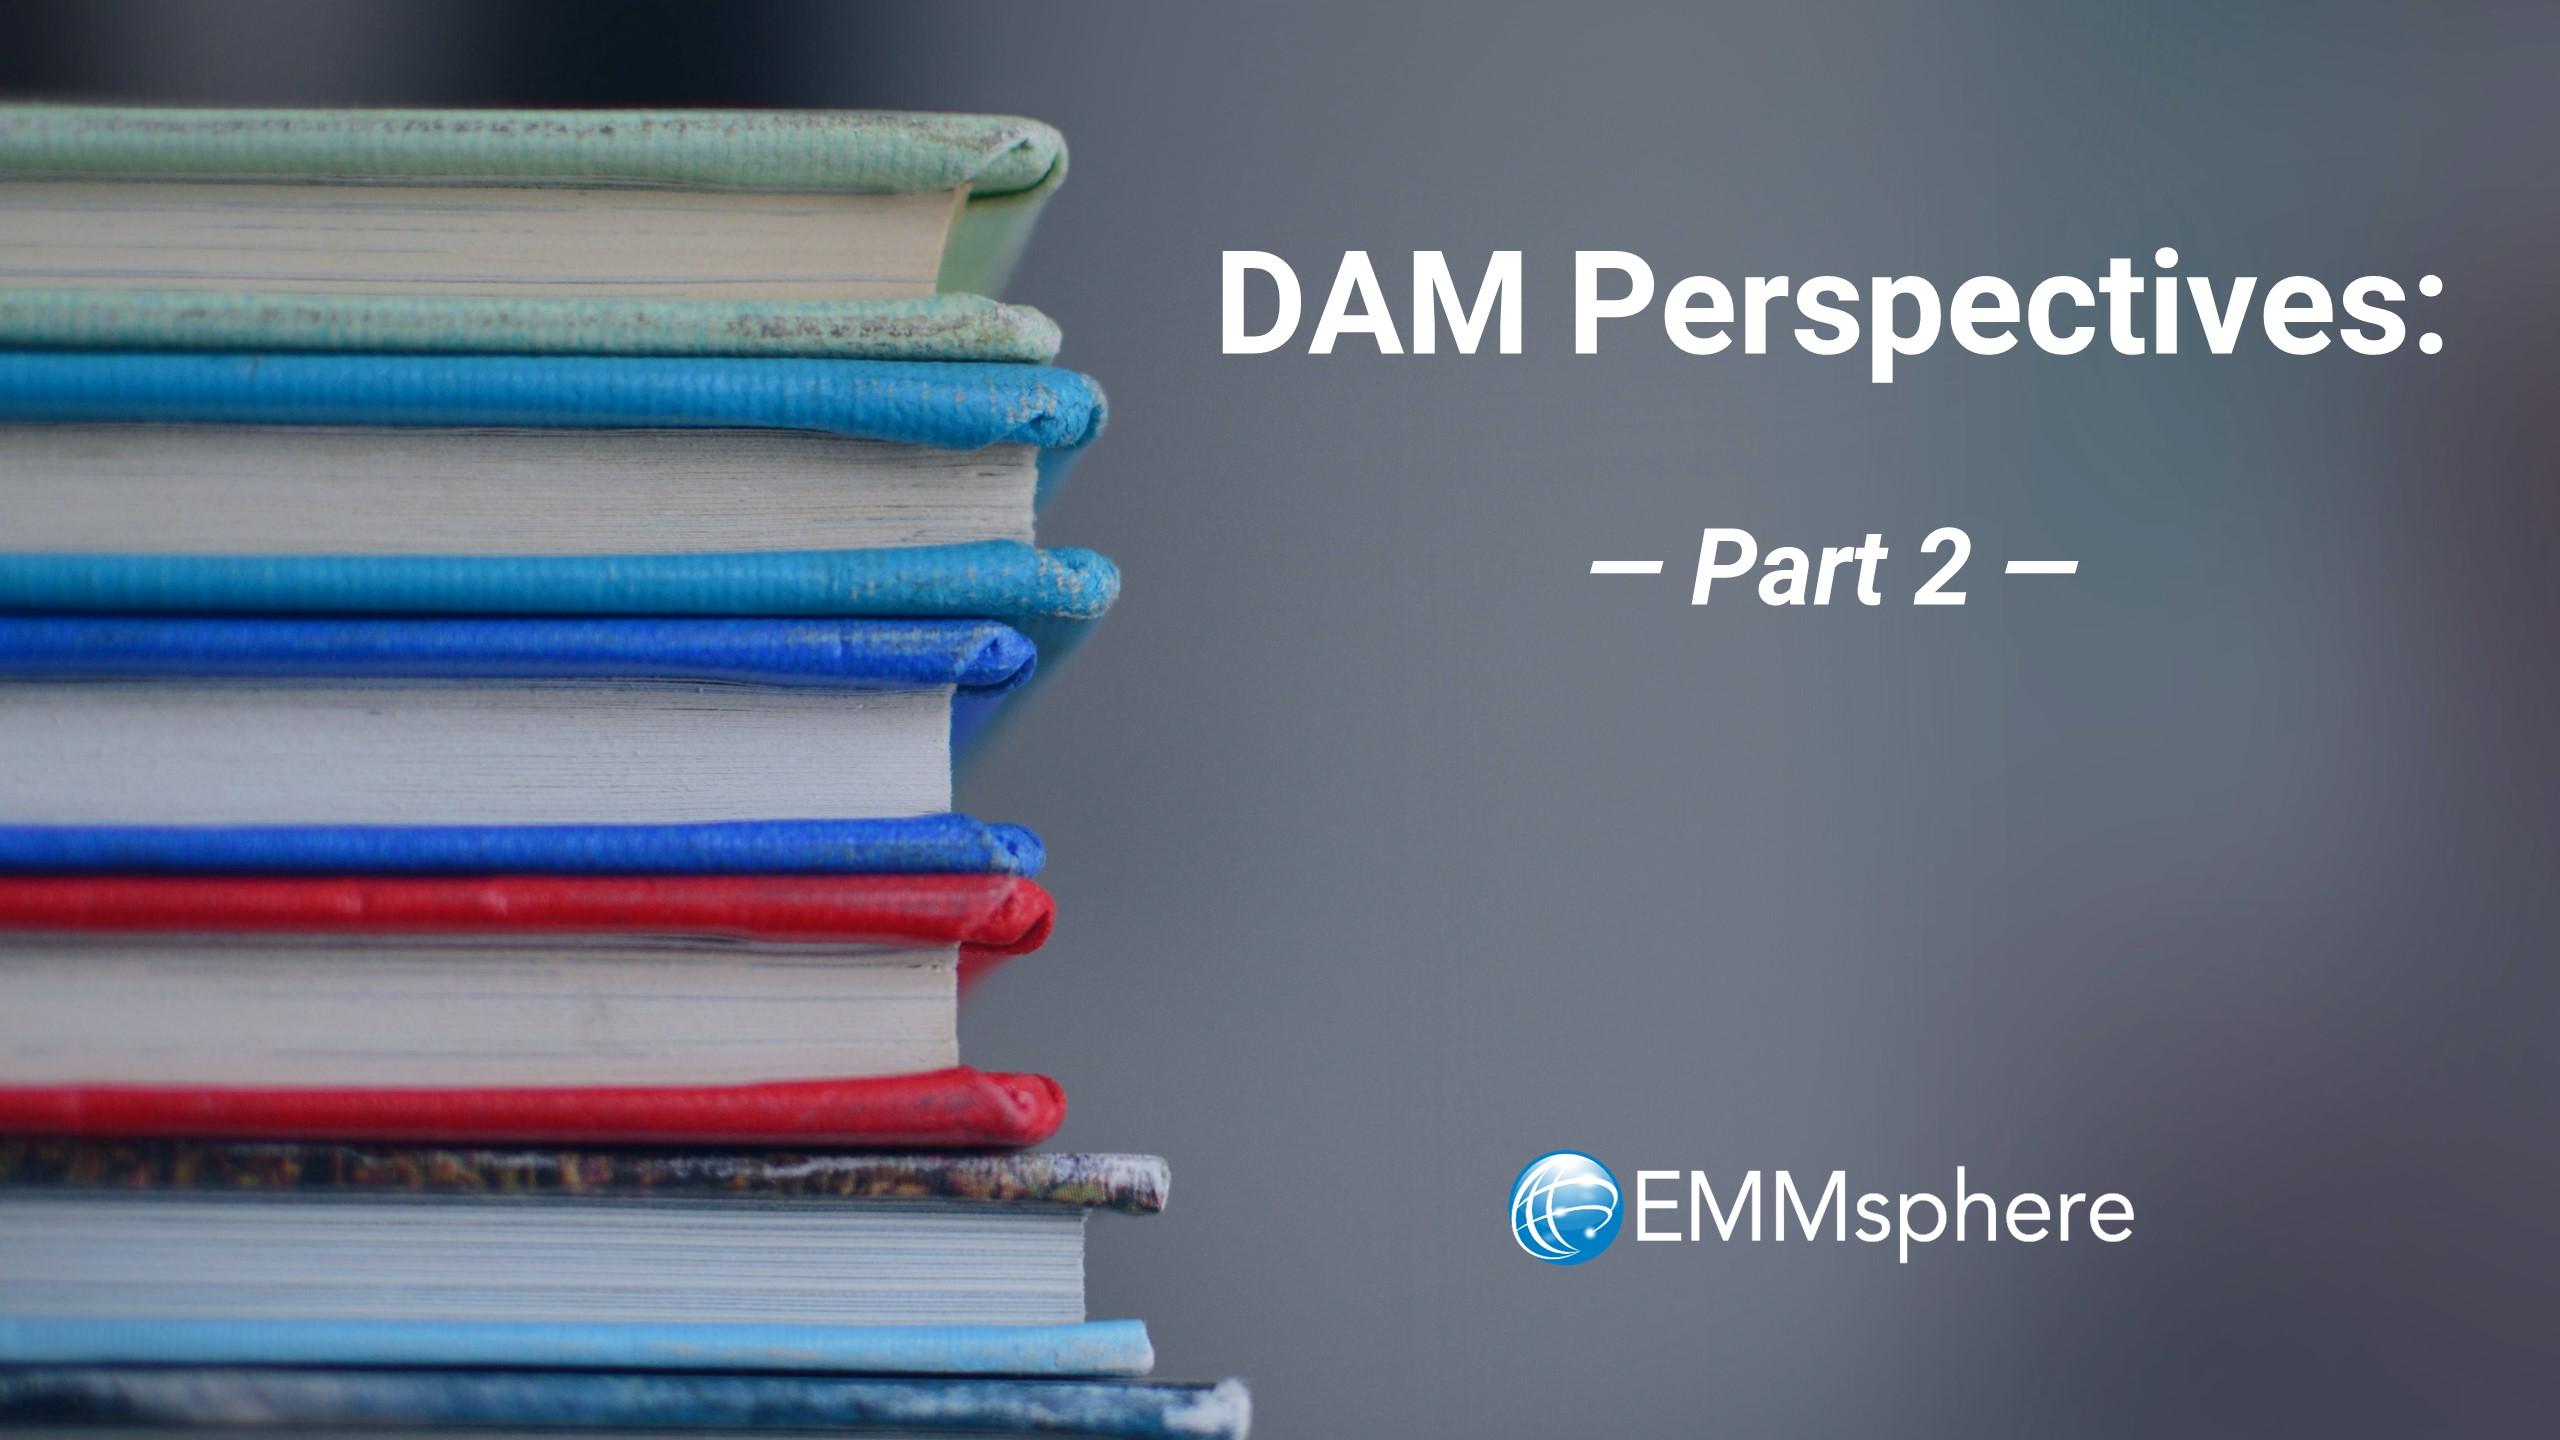 DAM Perspectives - Part 2